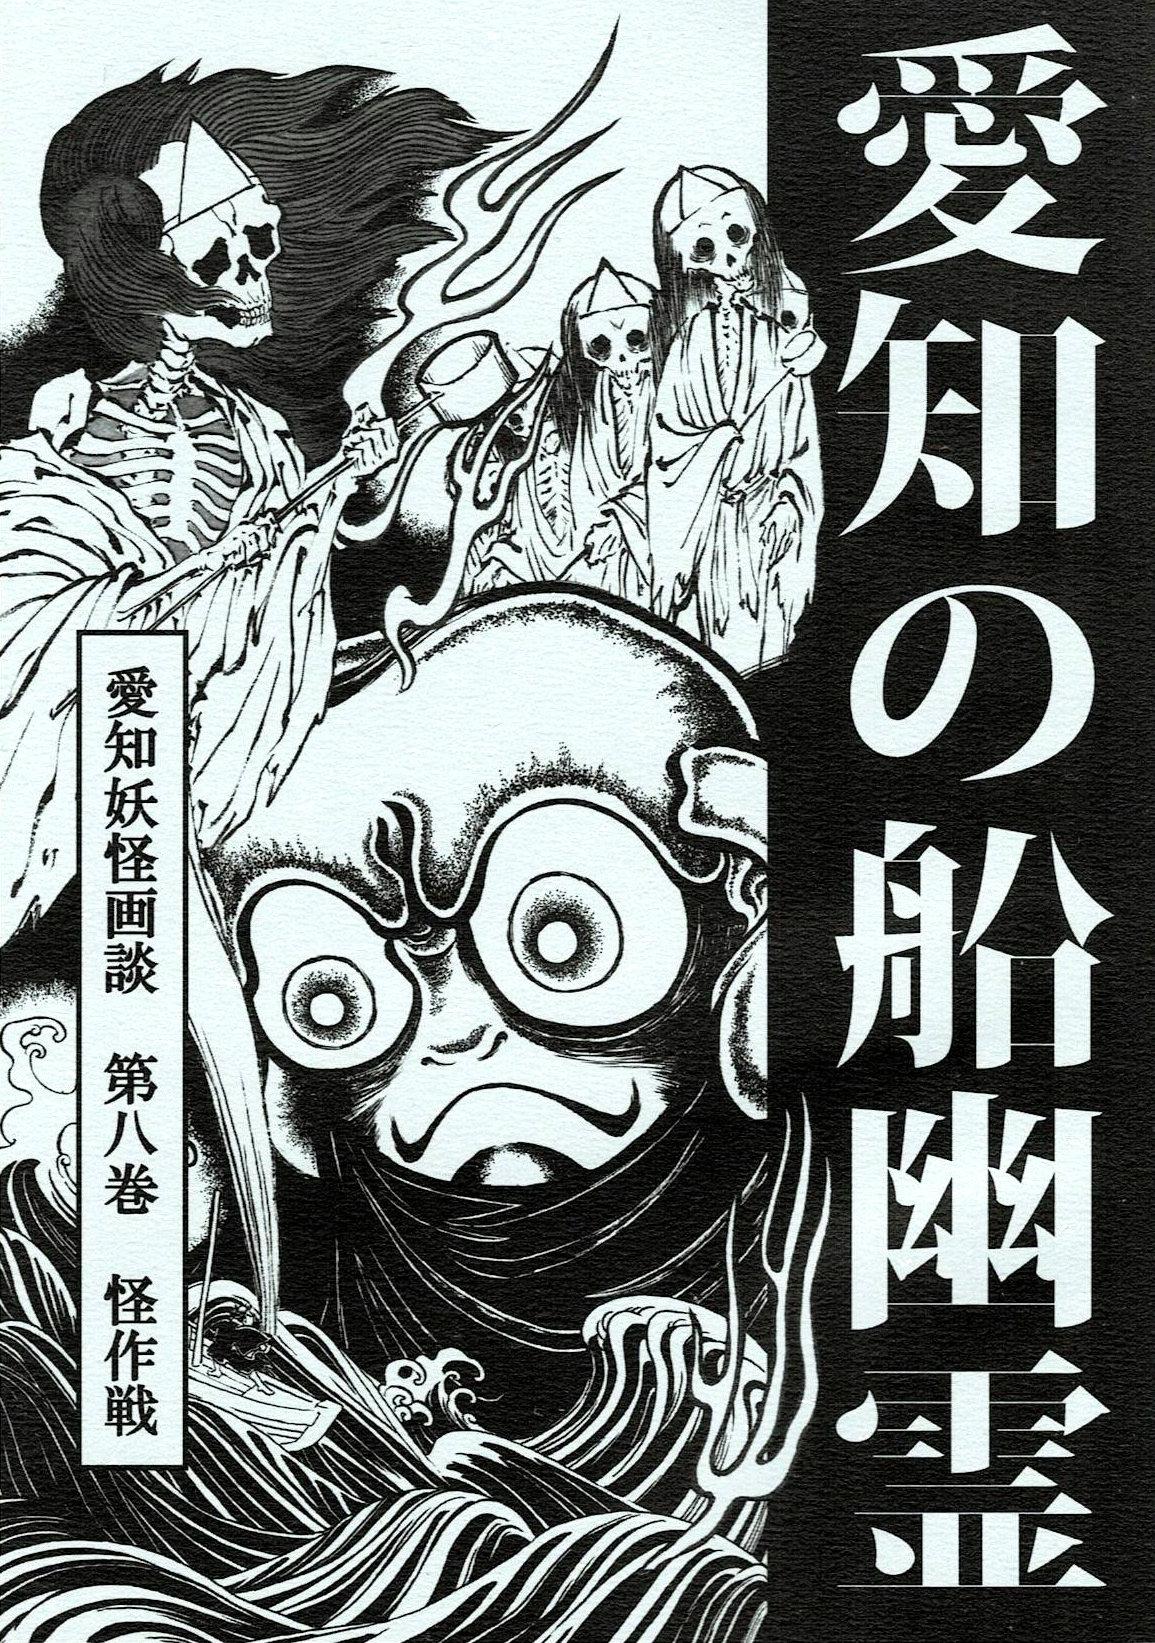 愛知の船幽霊 【怪作戦】画像